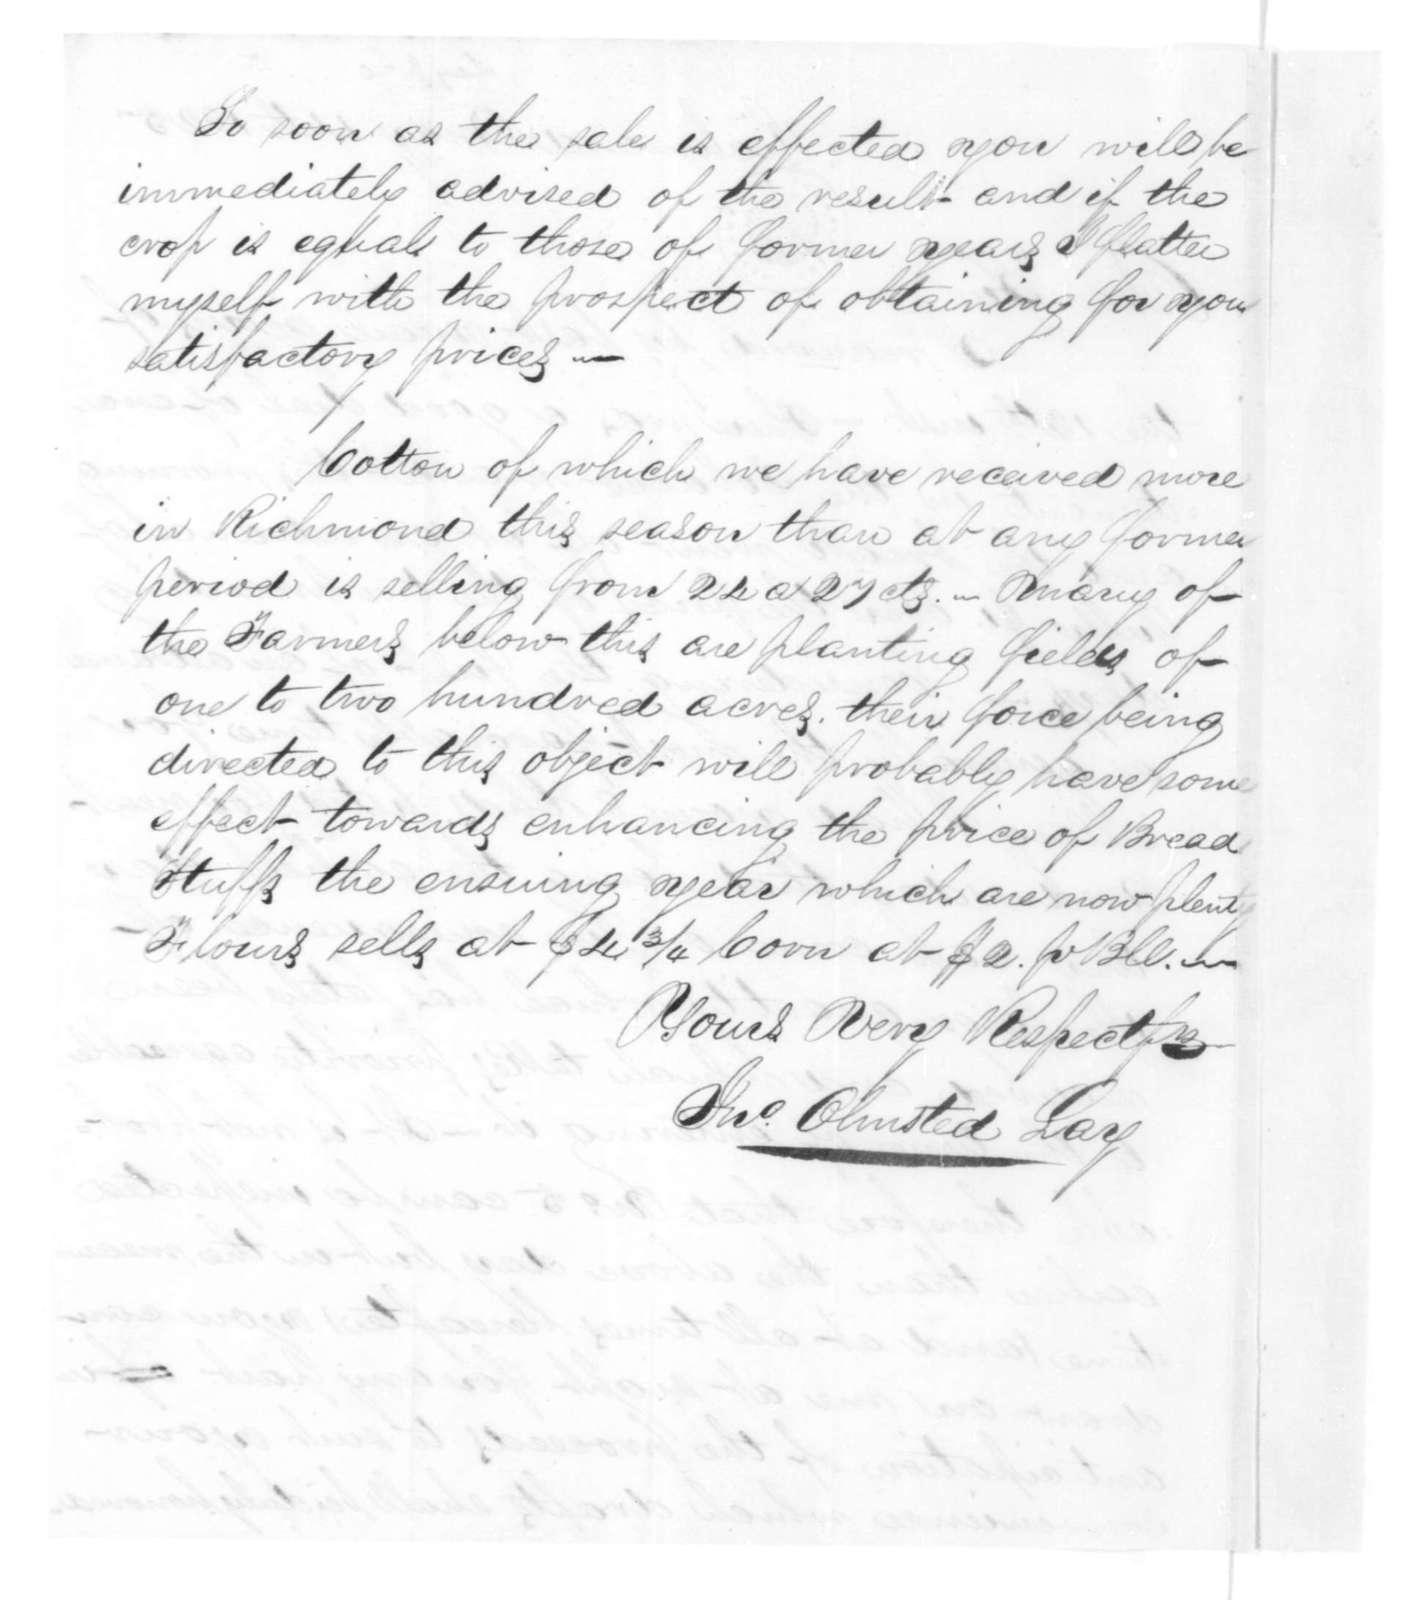 John Olmsted Lay to James Madison, May 14, 1825.